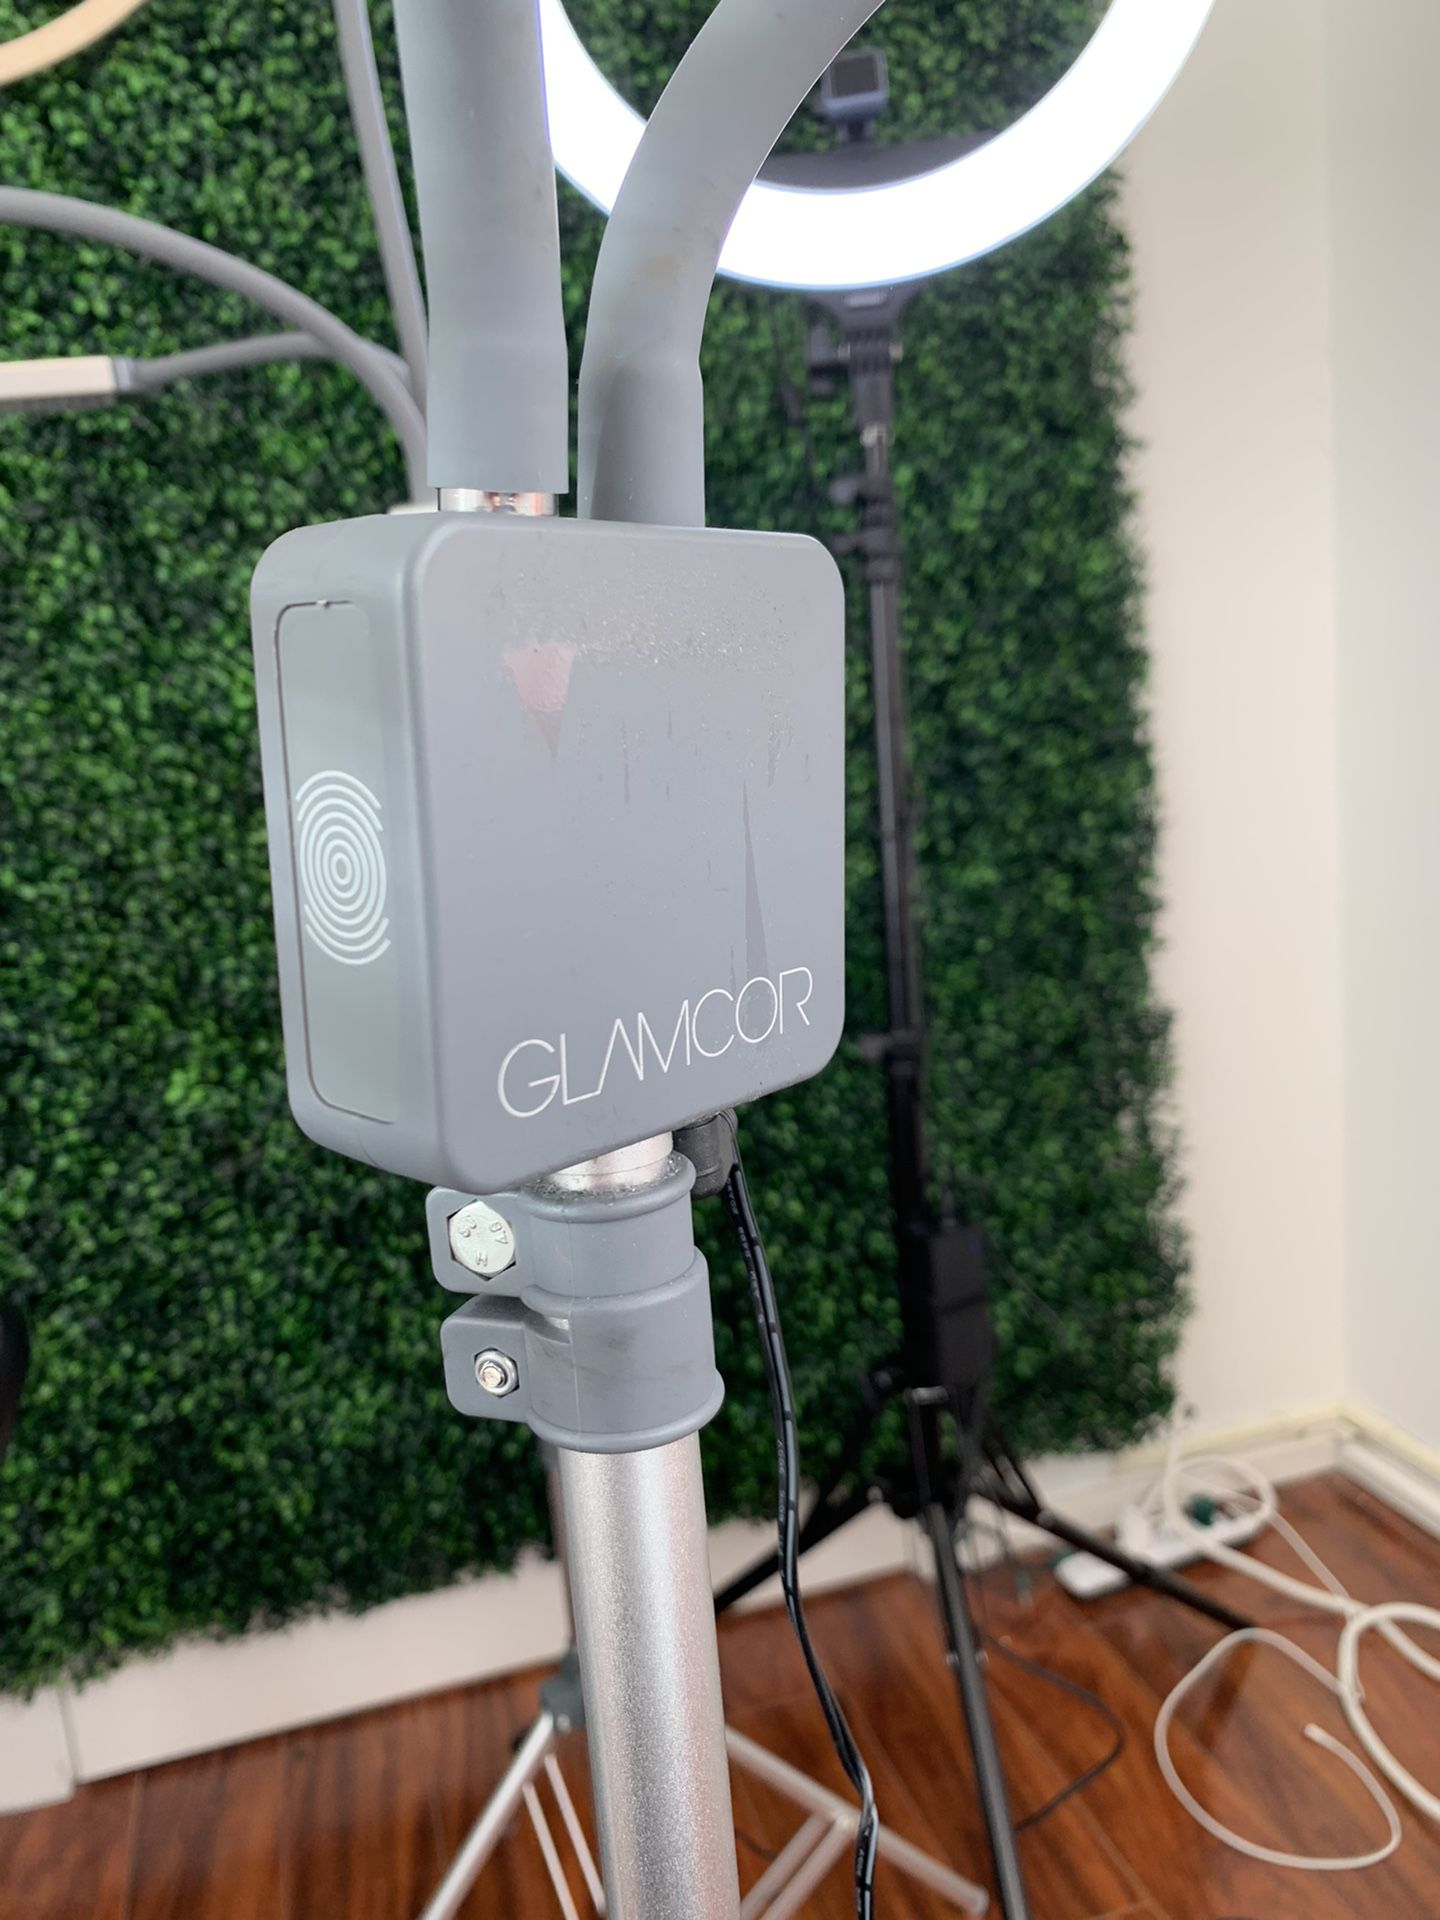 Glamcor Light Reg $245 + Tax